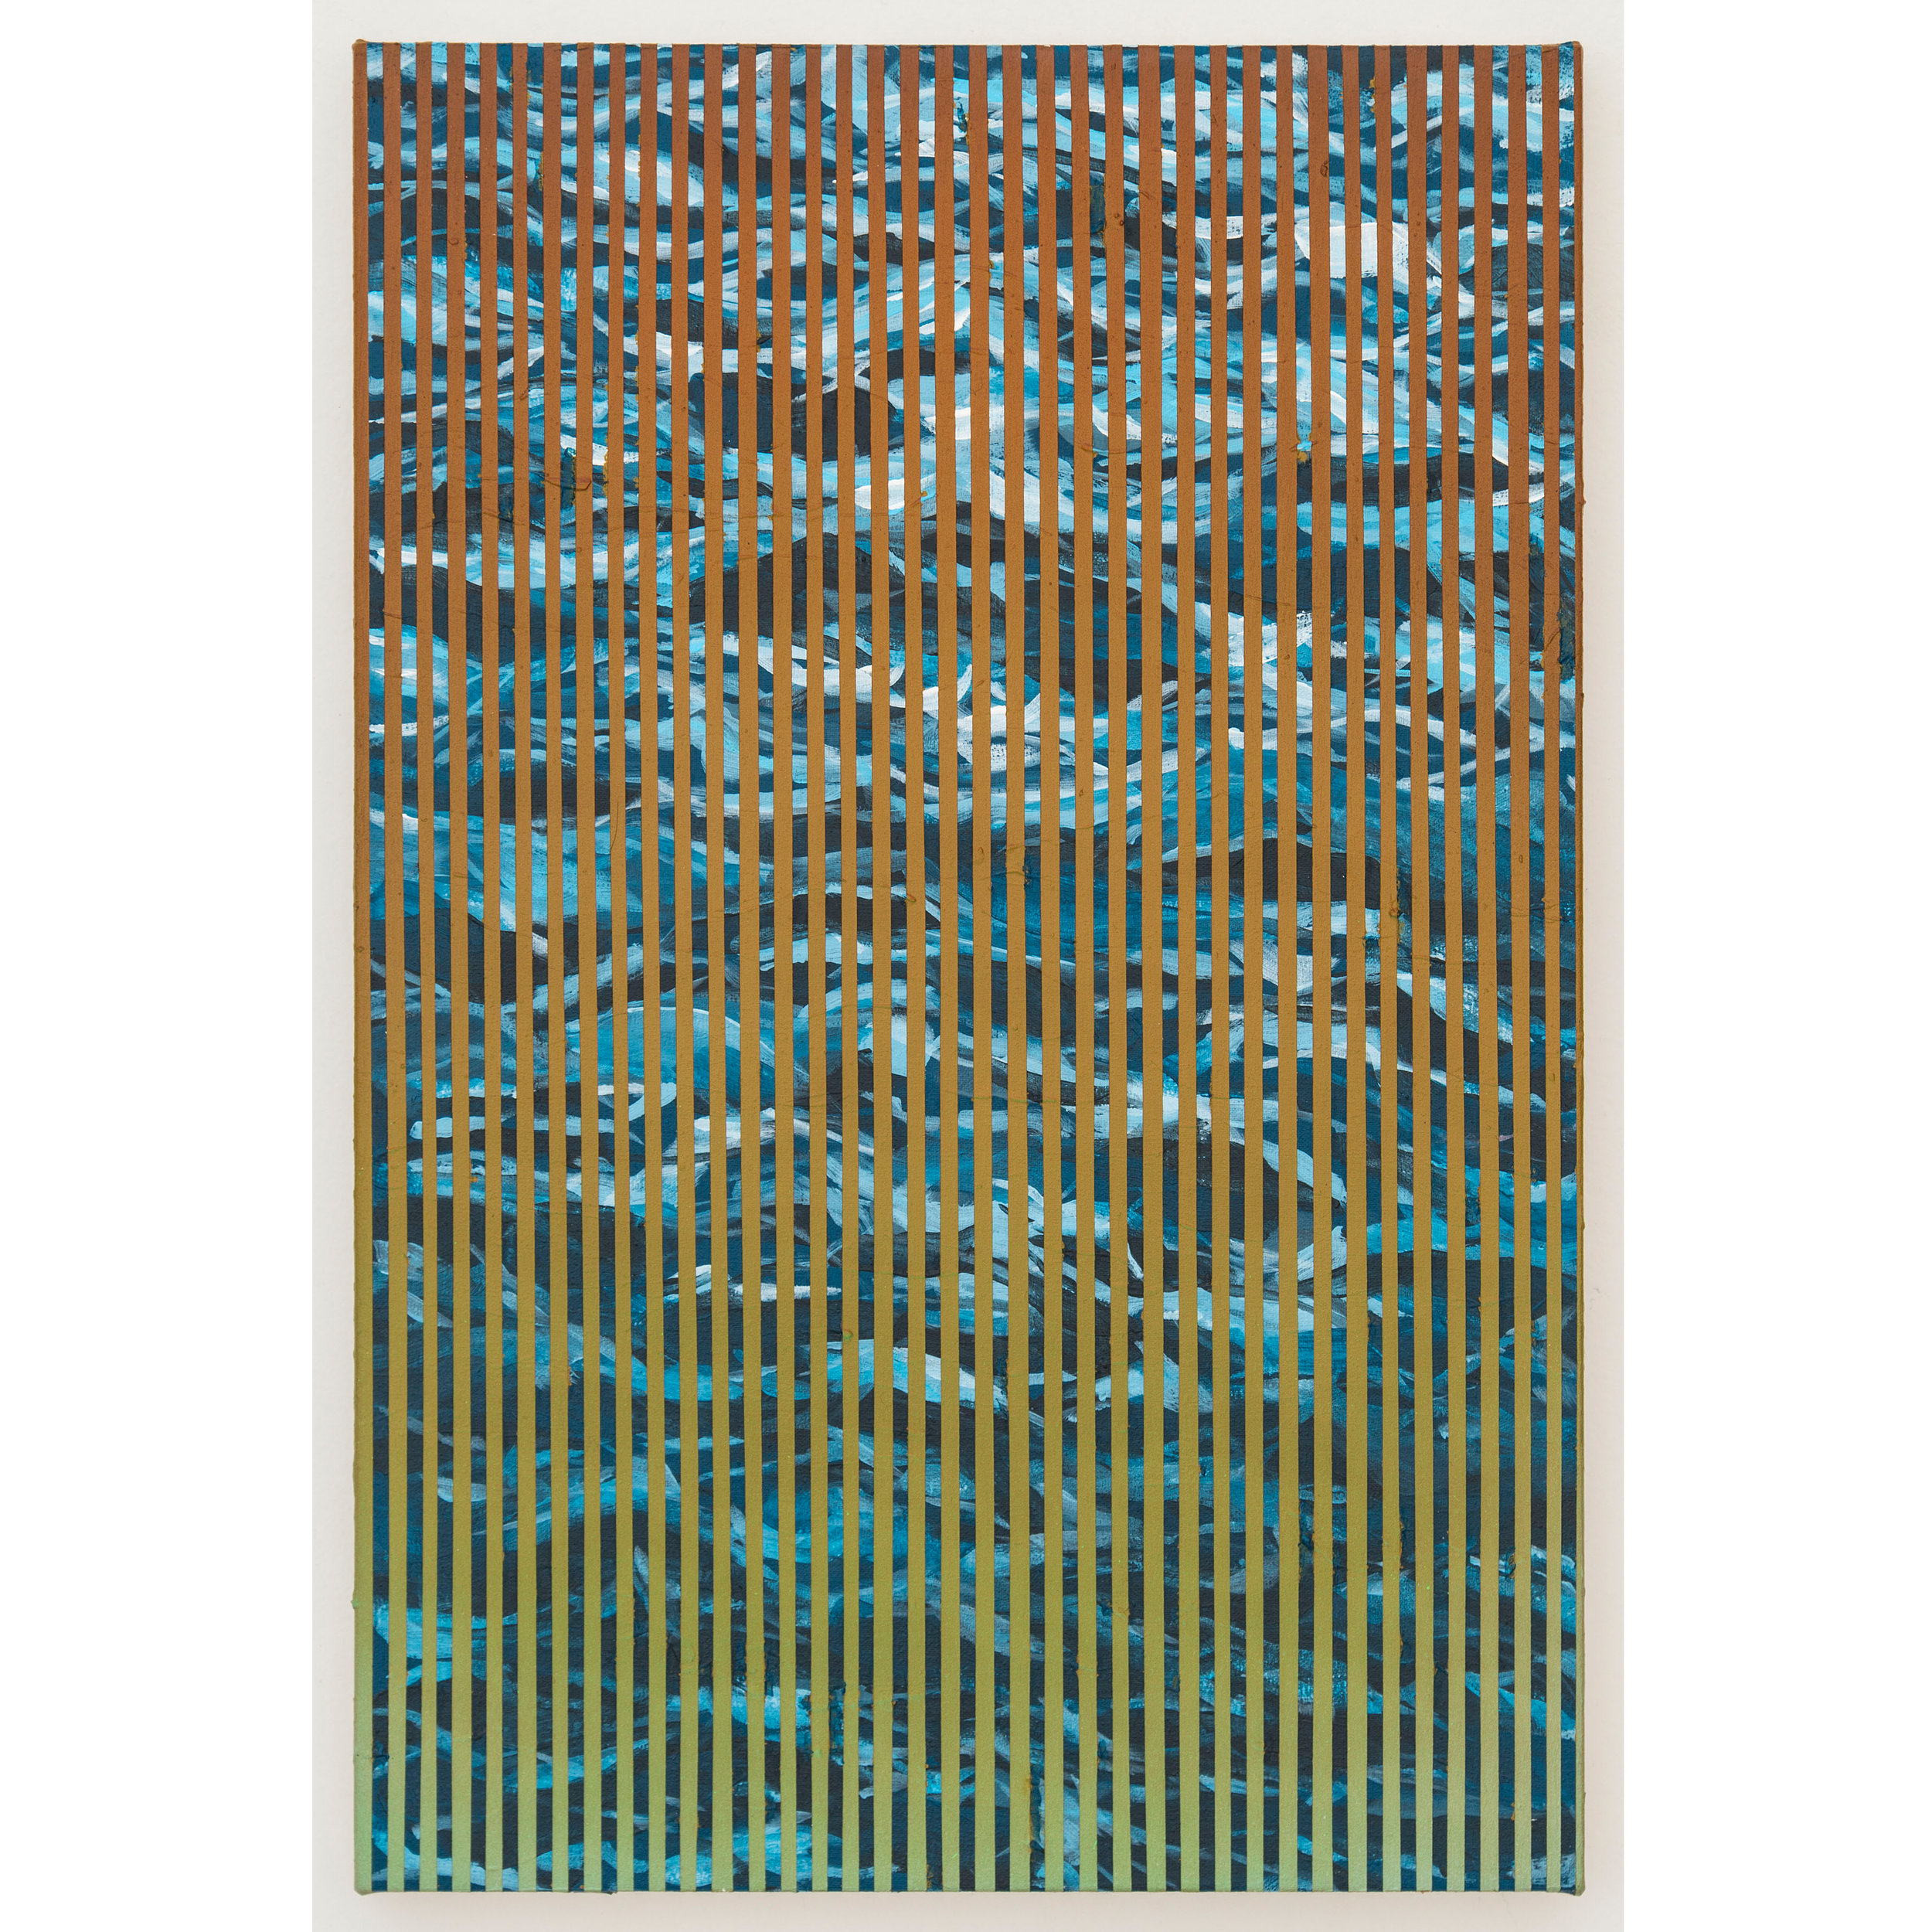 Wavenoise 1 , 2016, acrylic on canvas, 15 x 10 inches.